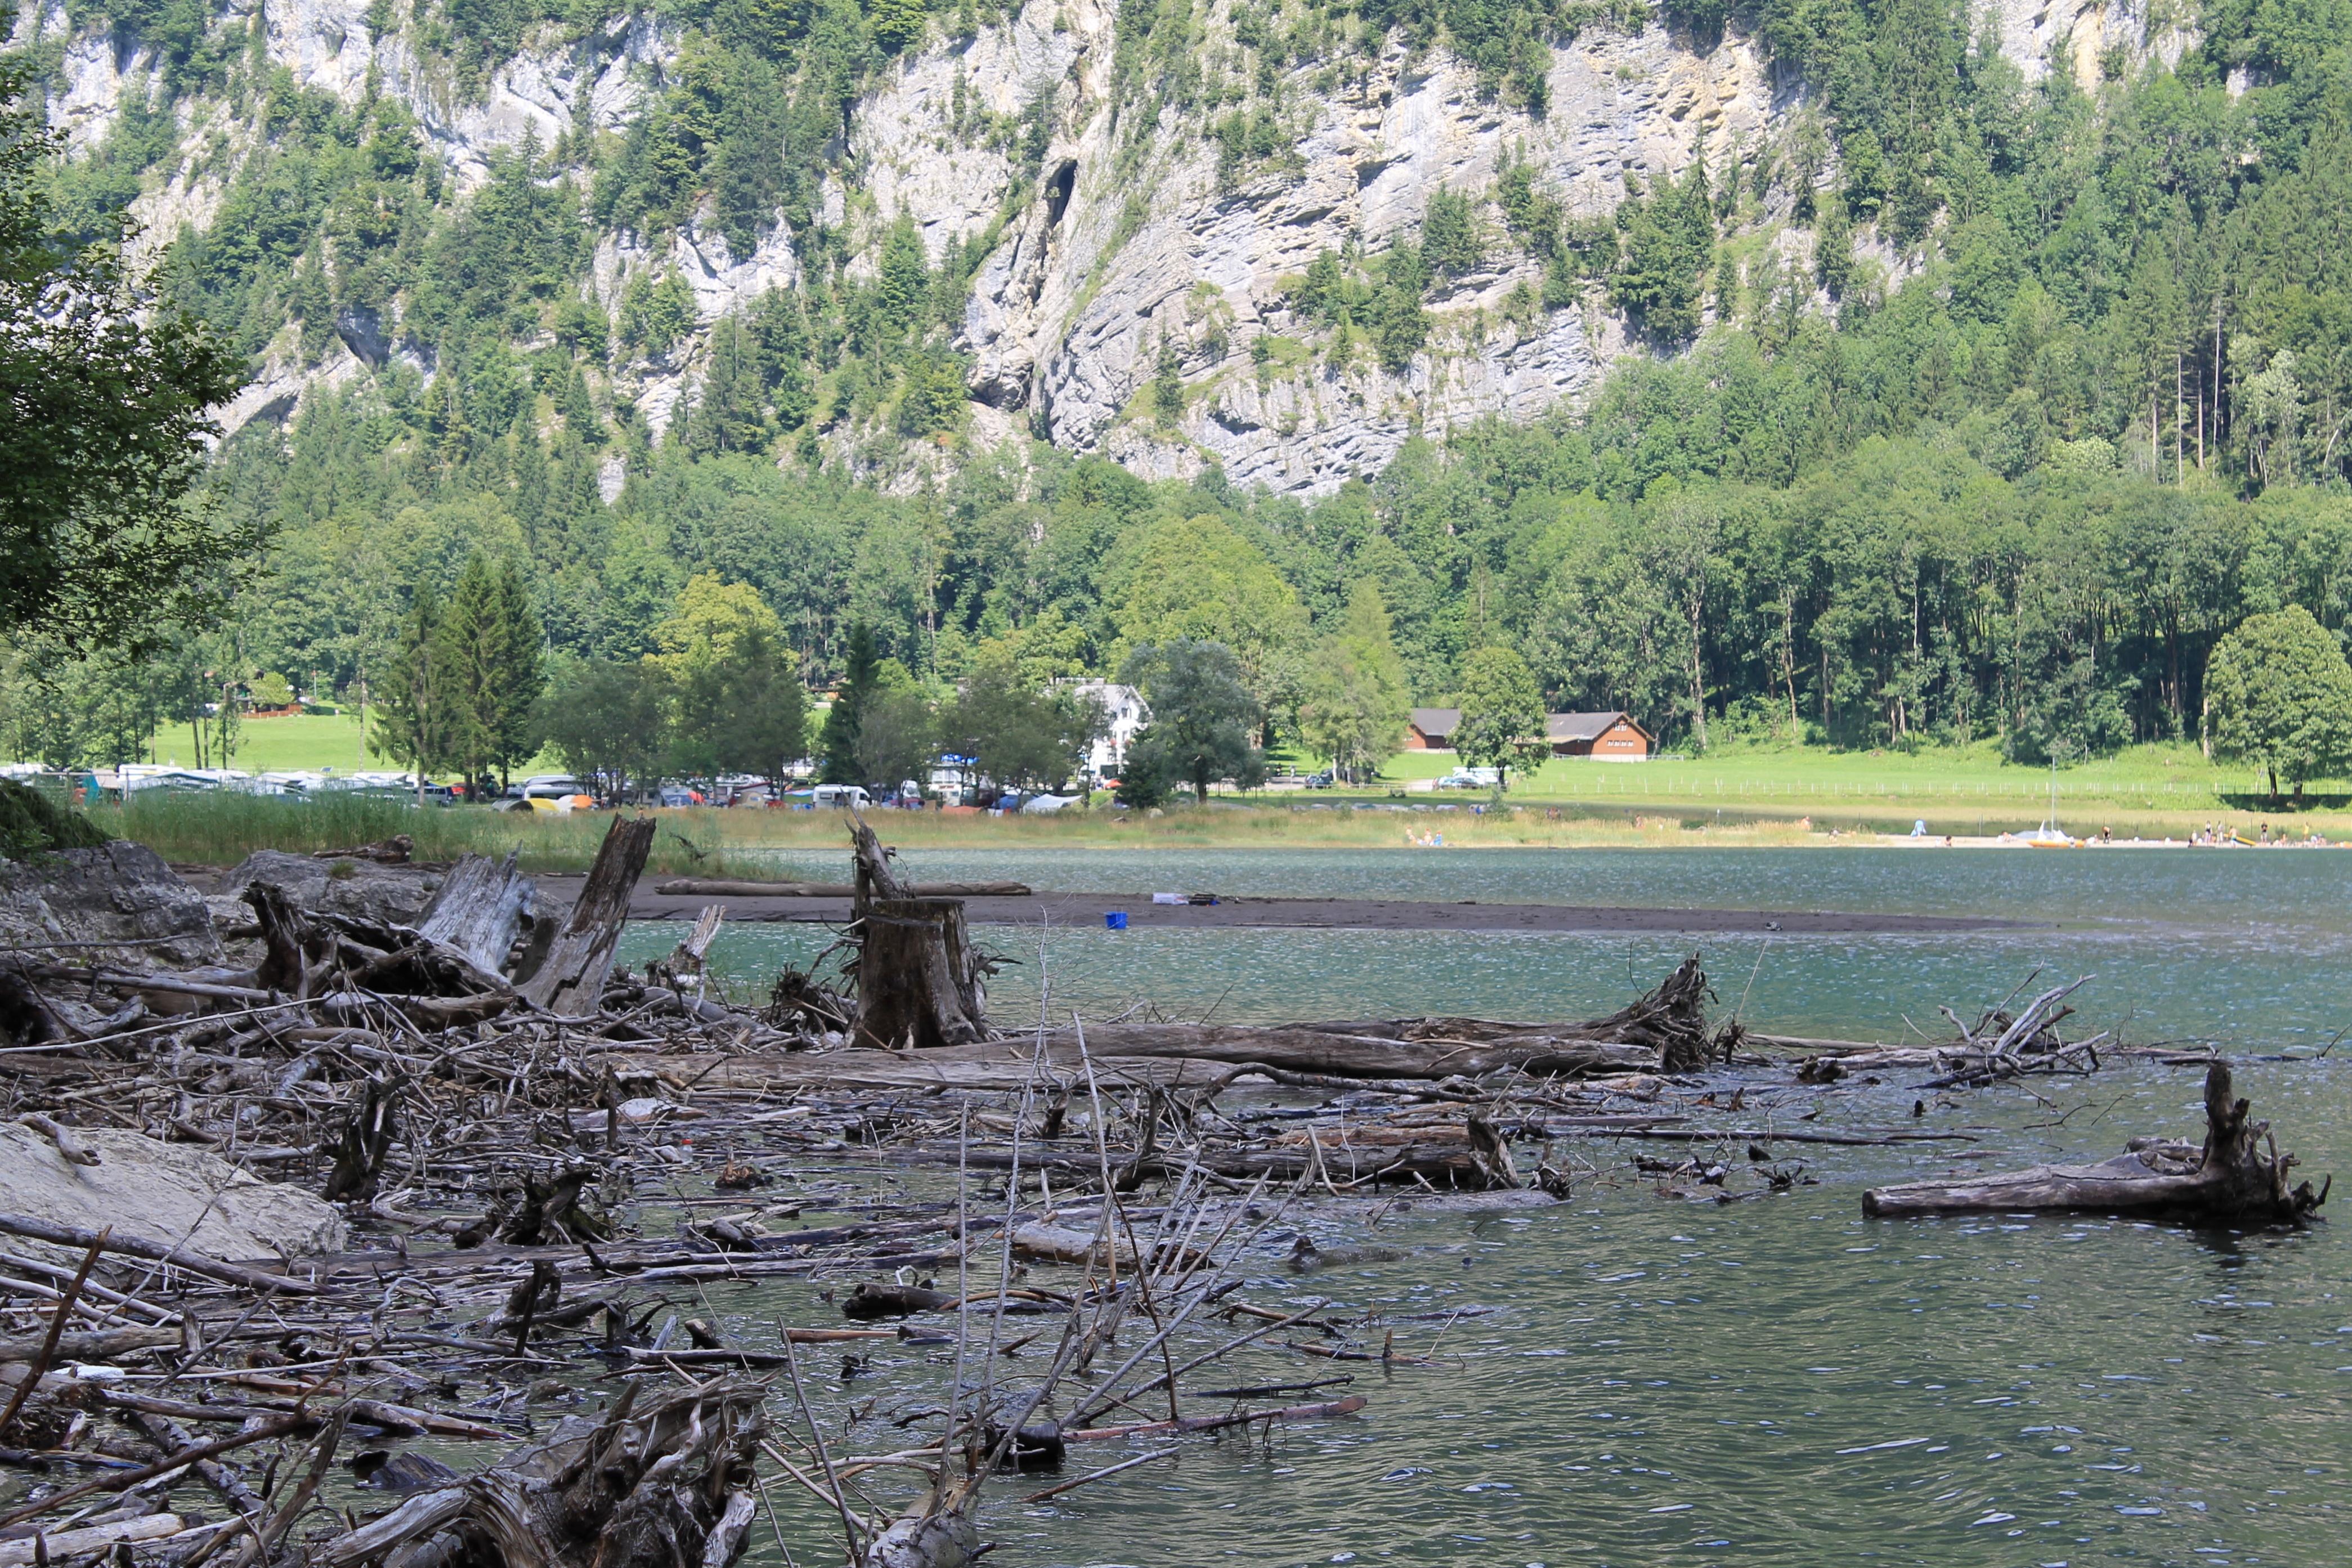 Fileklöntalersee Camping Vorauen 9691797169jpg Wikimedia Commons